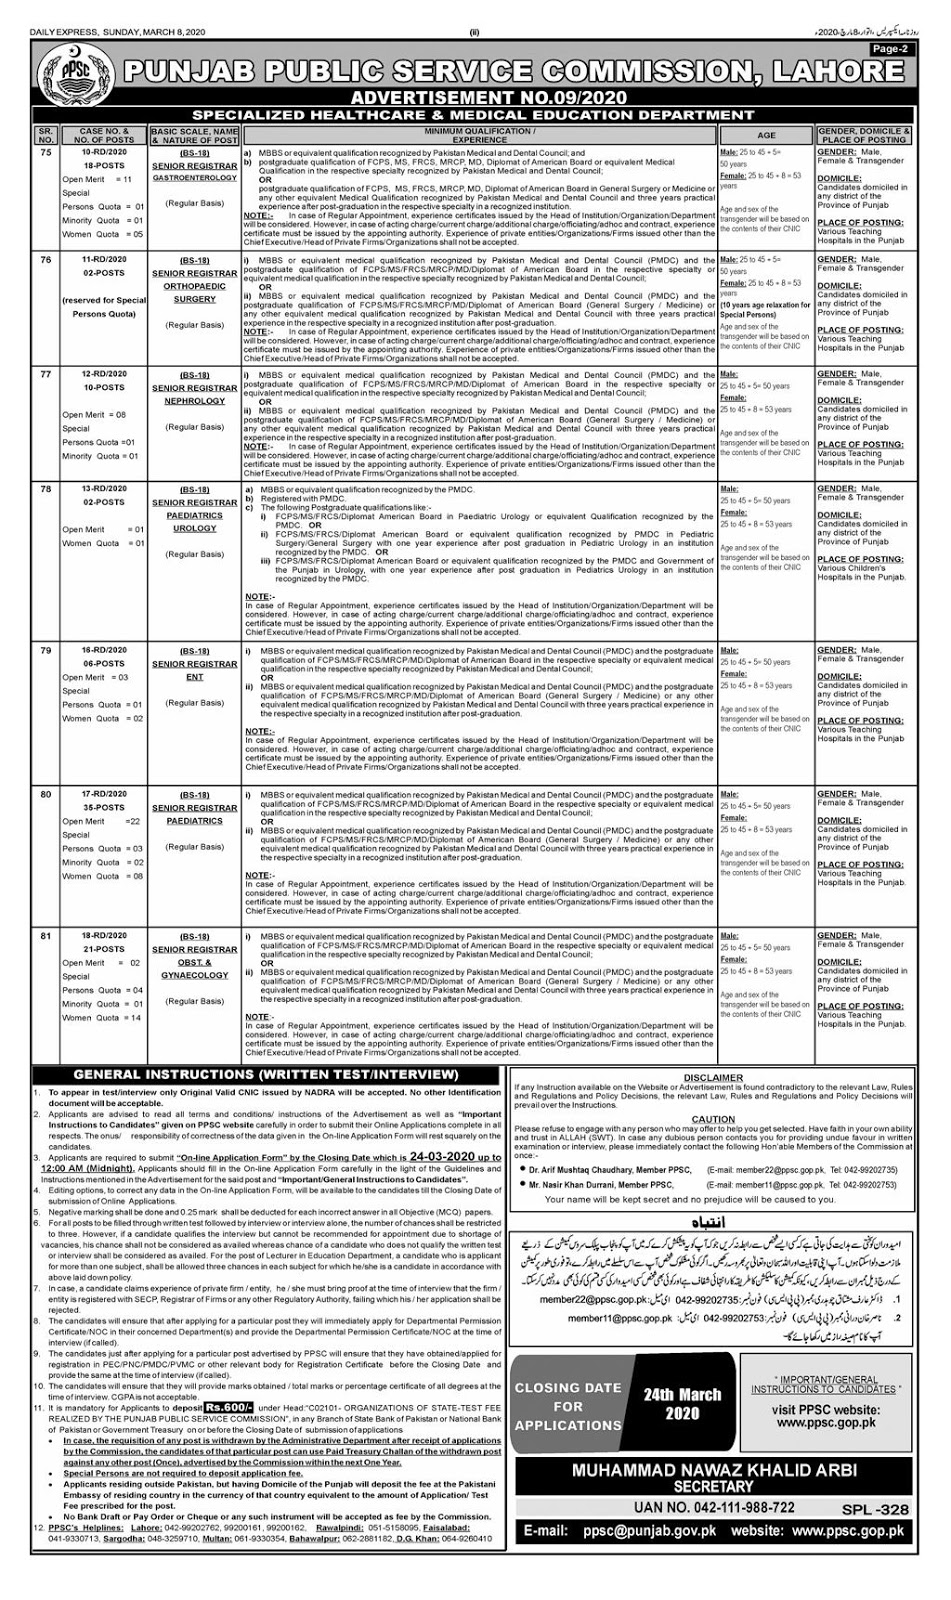 Jobs in Punjab Public Service Commission (PPSC) 2020